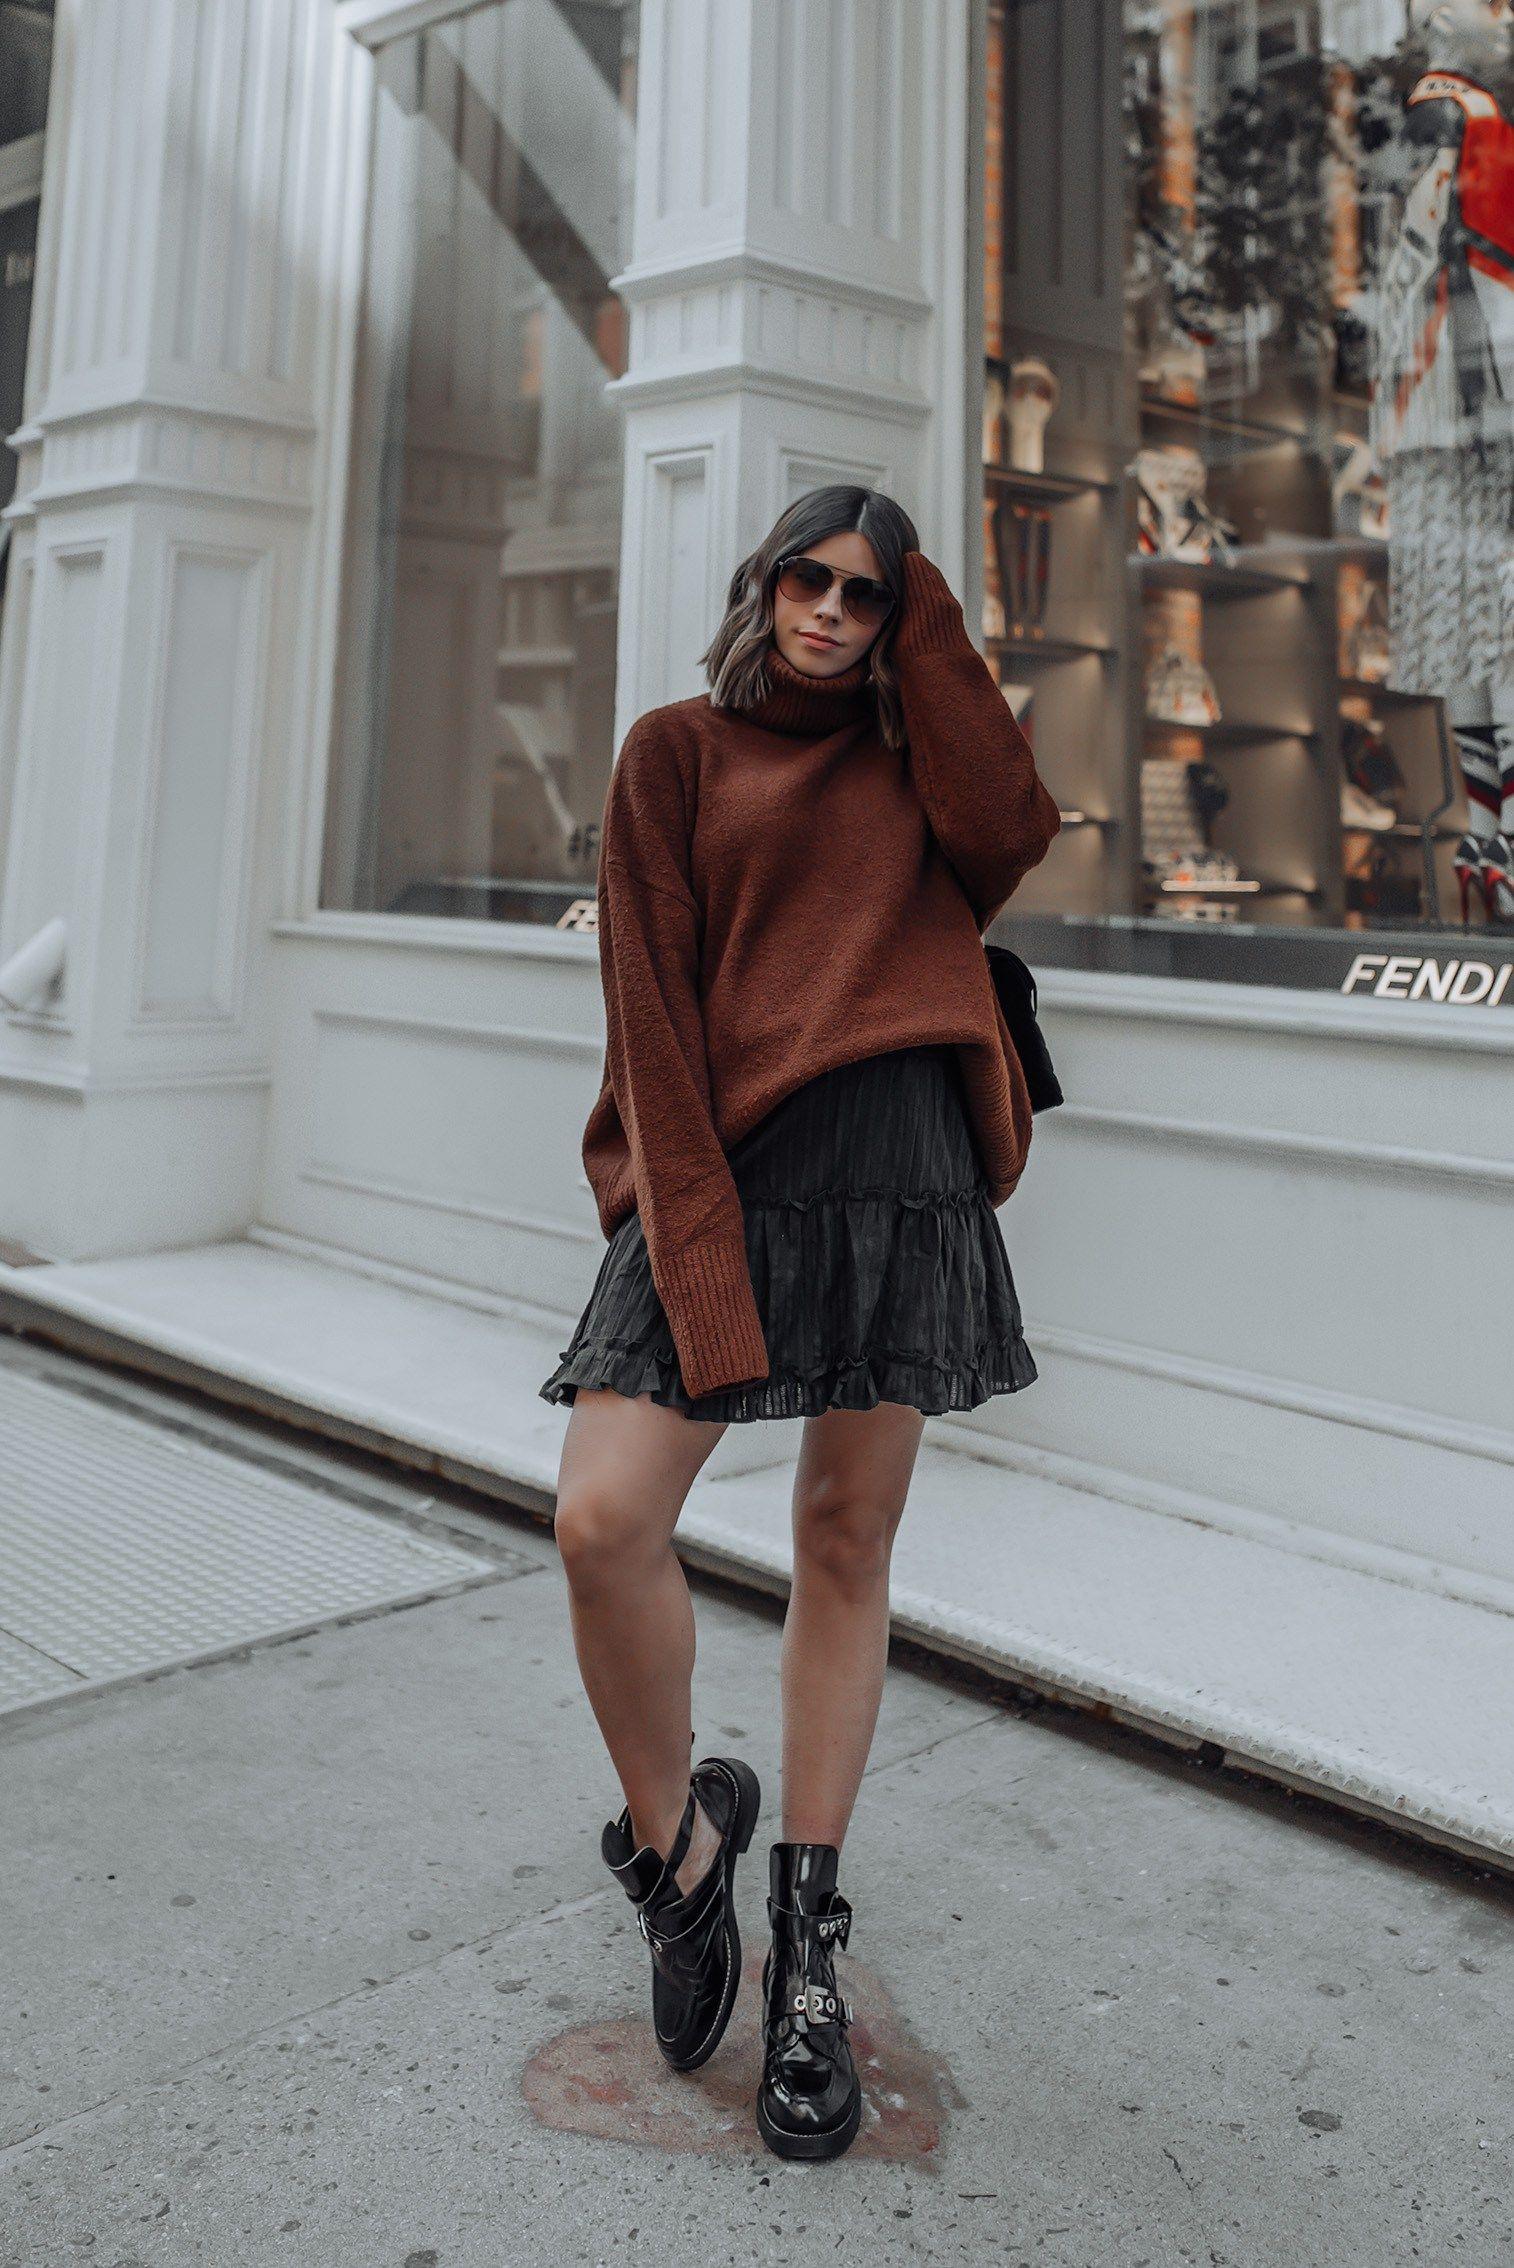 1c49176af Oversized Sweater | Black Mini Skirt | YSL LouLou in Velvet | #streetstyle  #ysl #nycblog #sohonyc #liketkit